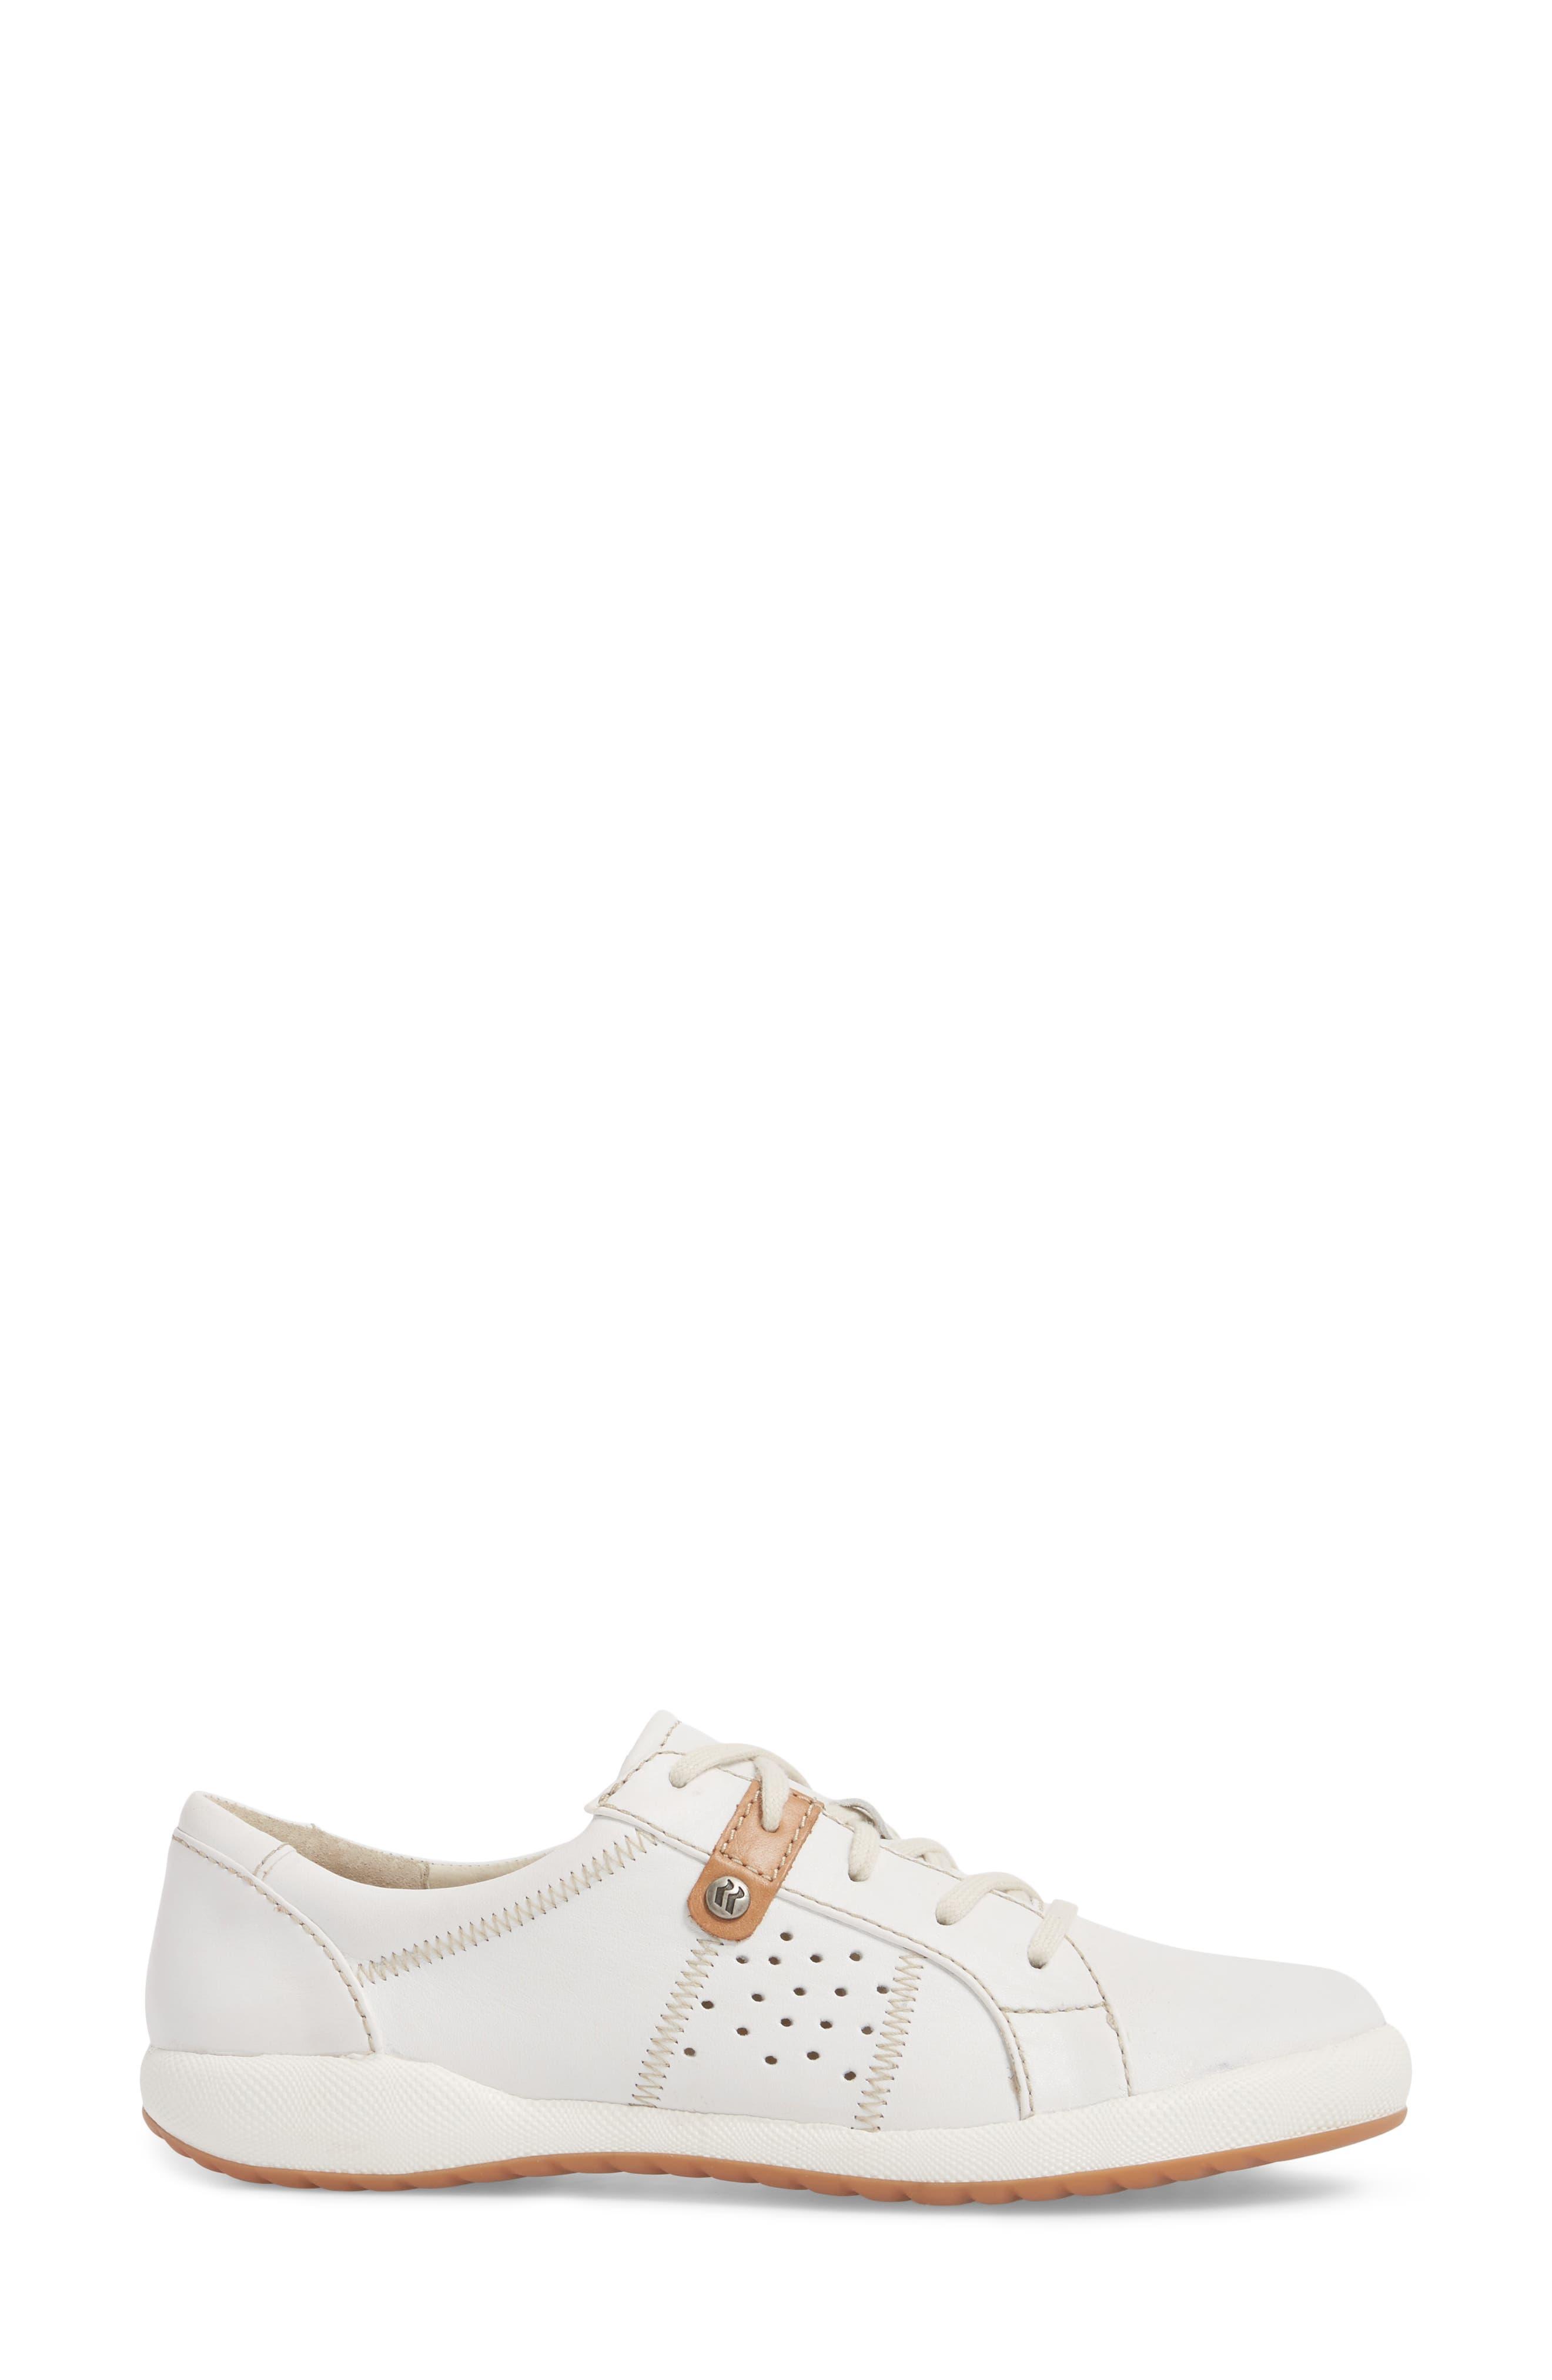 Cordoba 01 Sneaker,                             Alternate thumbnail 3, color,                             WHITE LEATHER